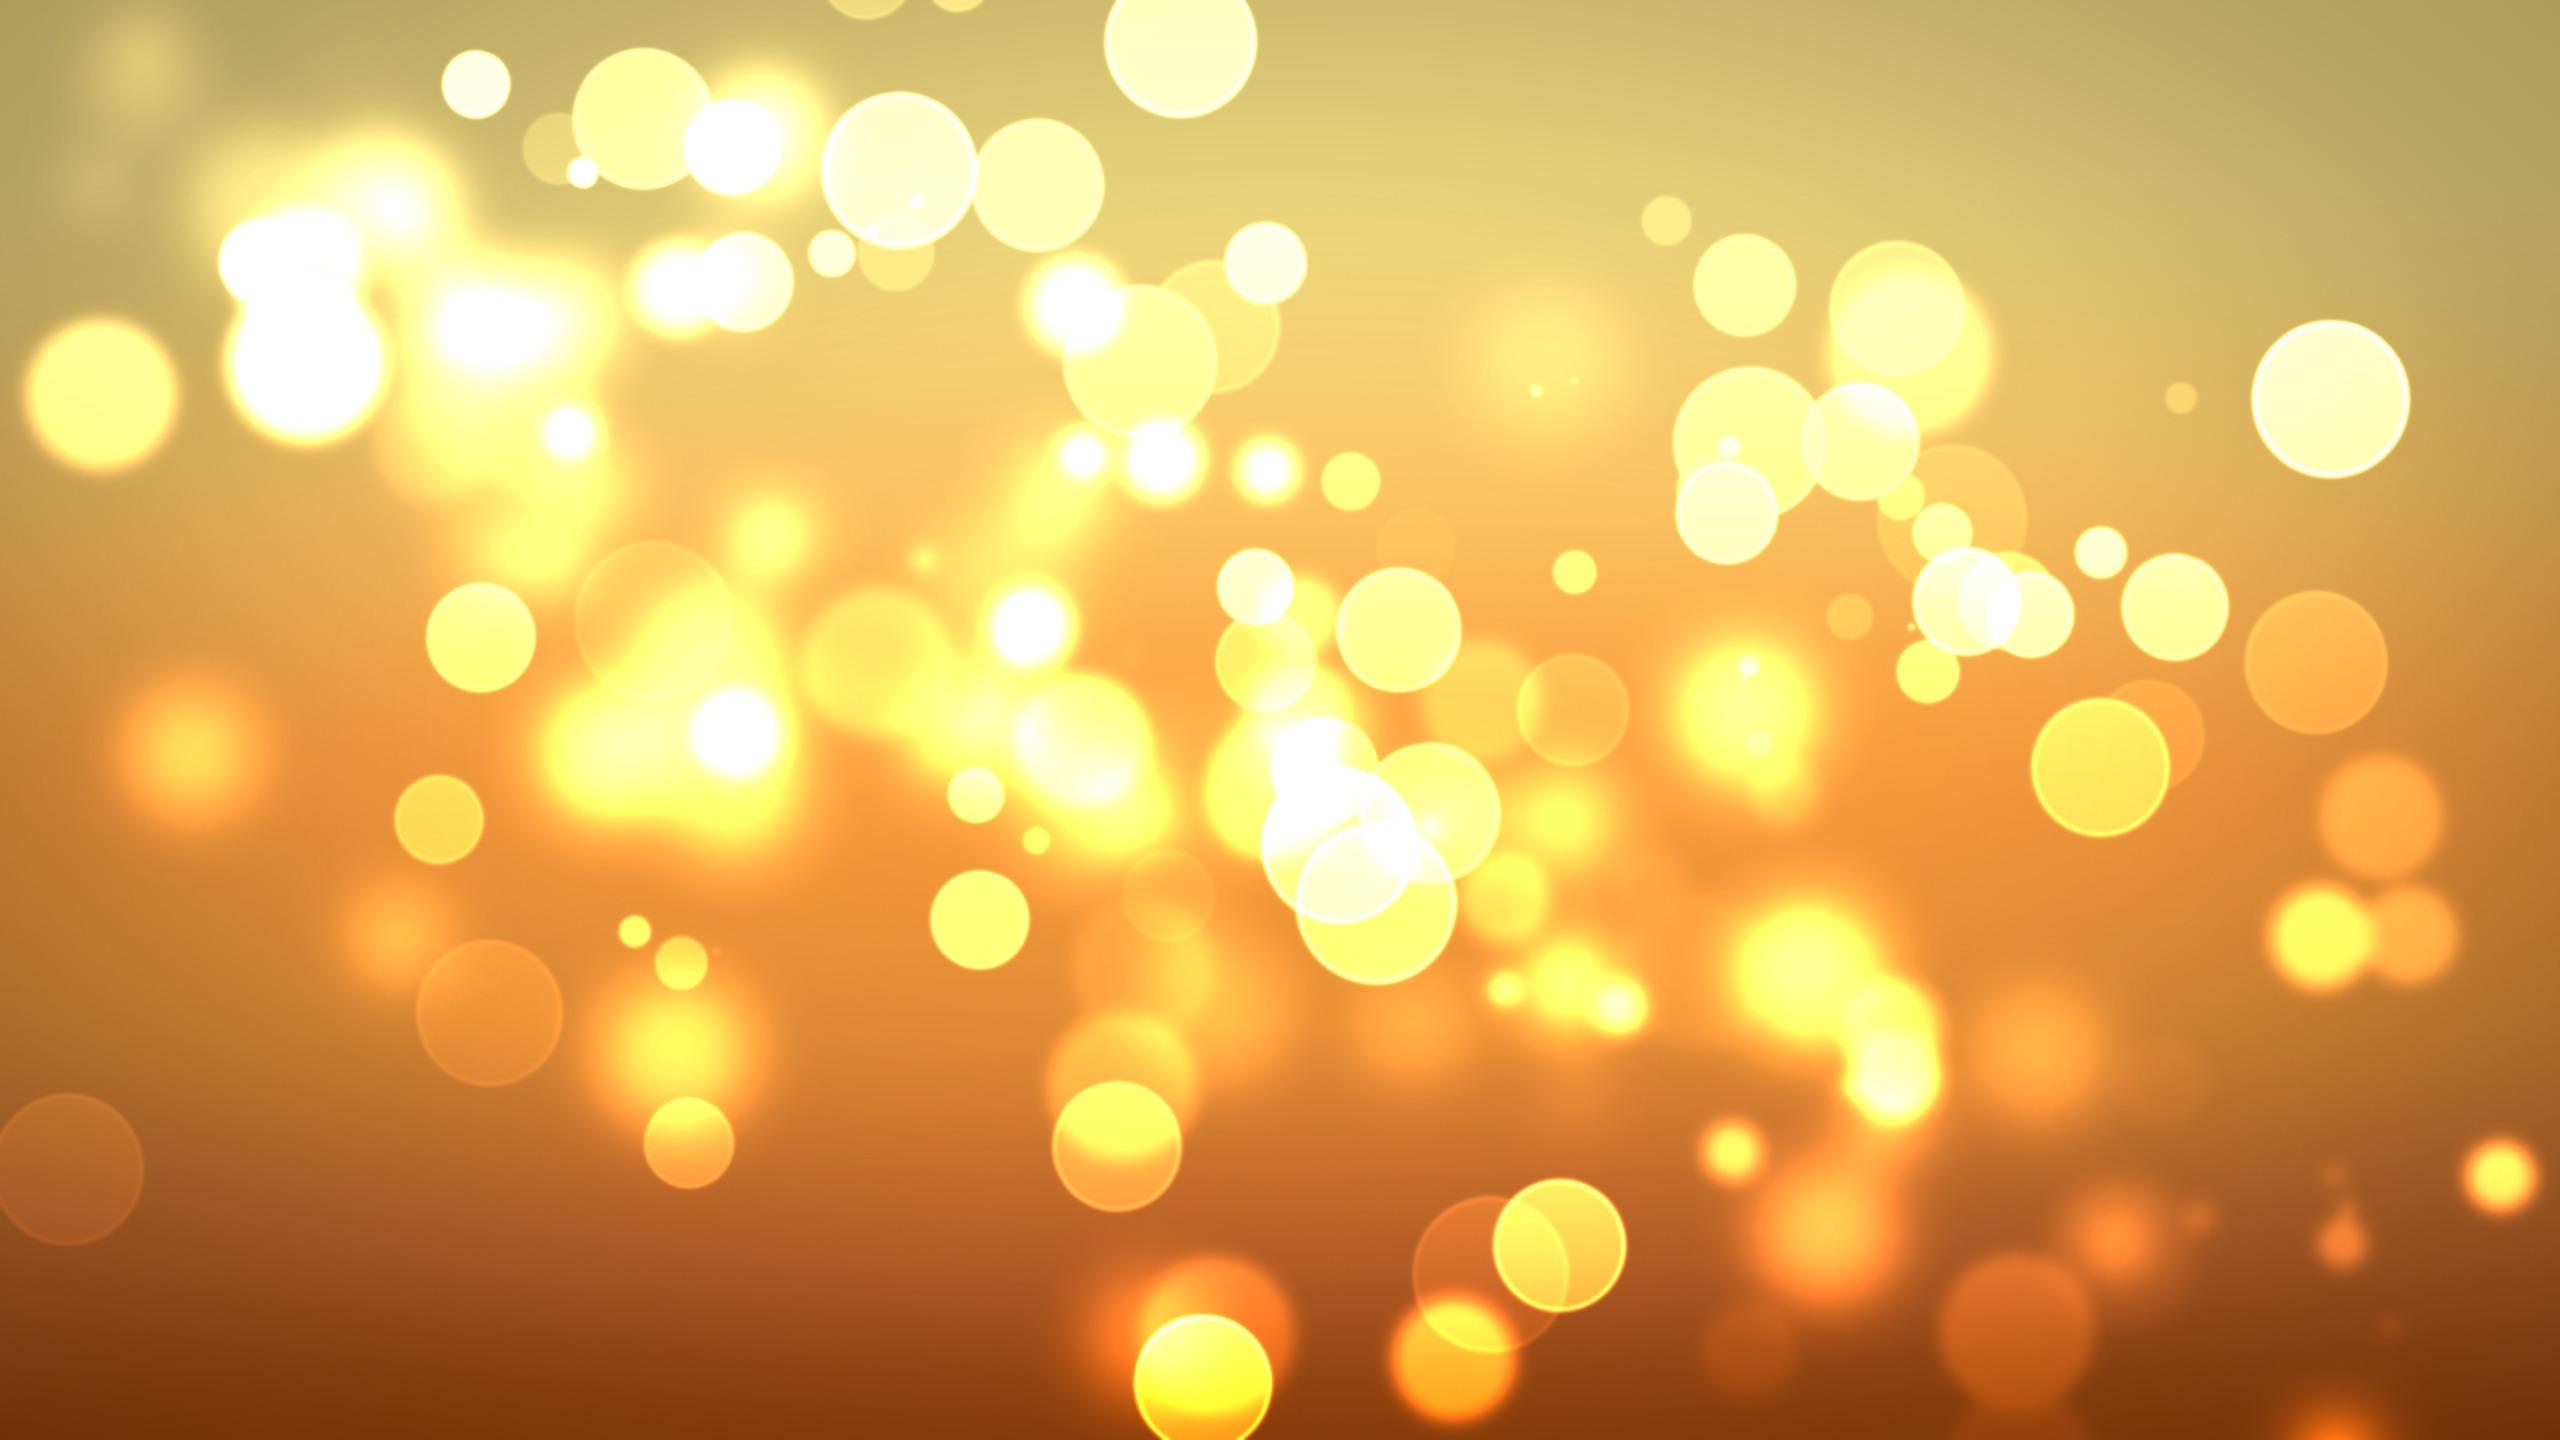 light, texture light, light background yellow texture, background, photo